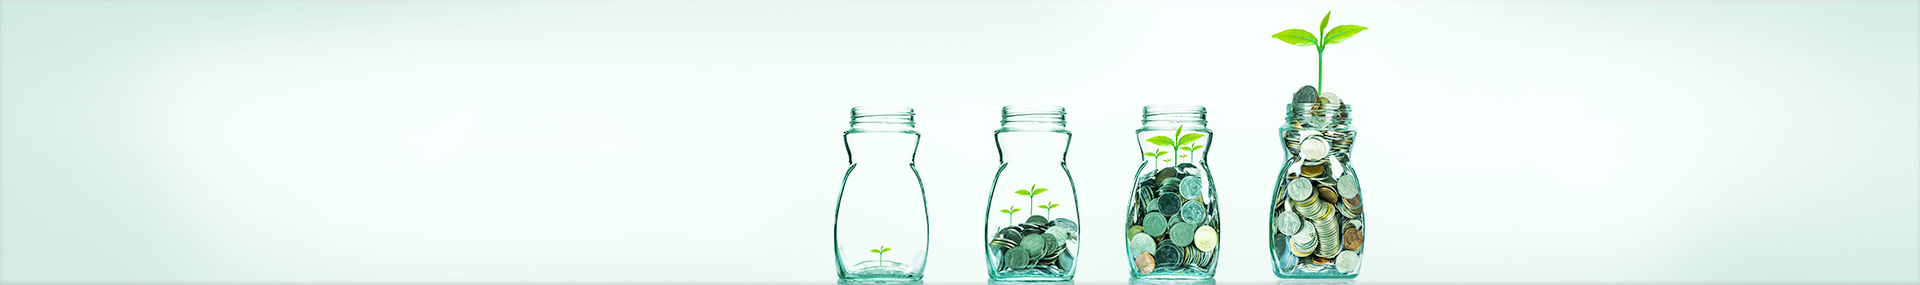 Savings Accounts - Open Savings Account Online - Axis Bank